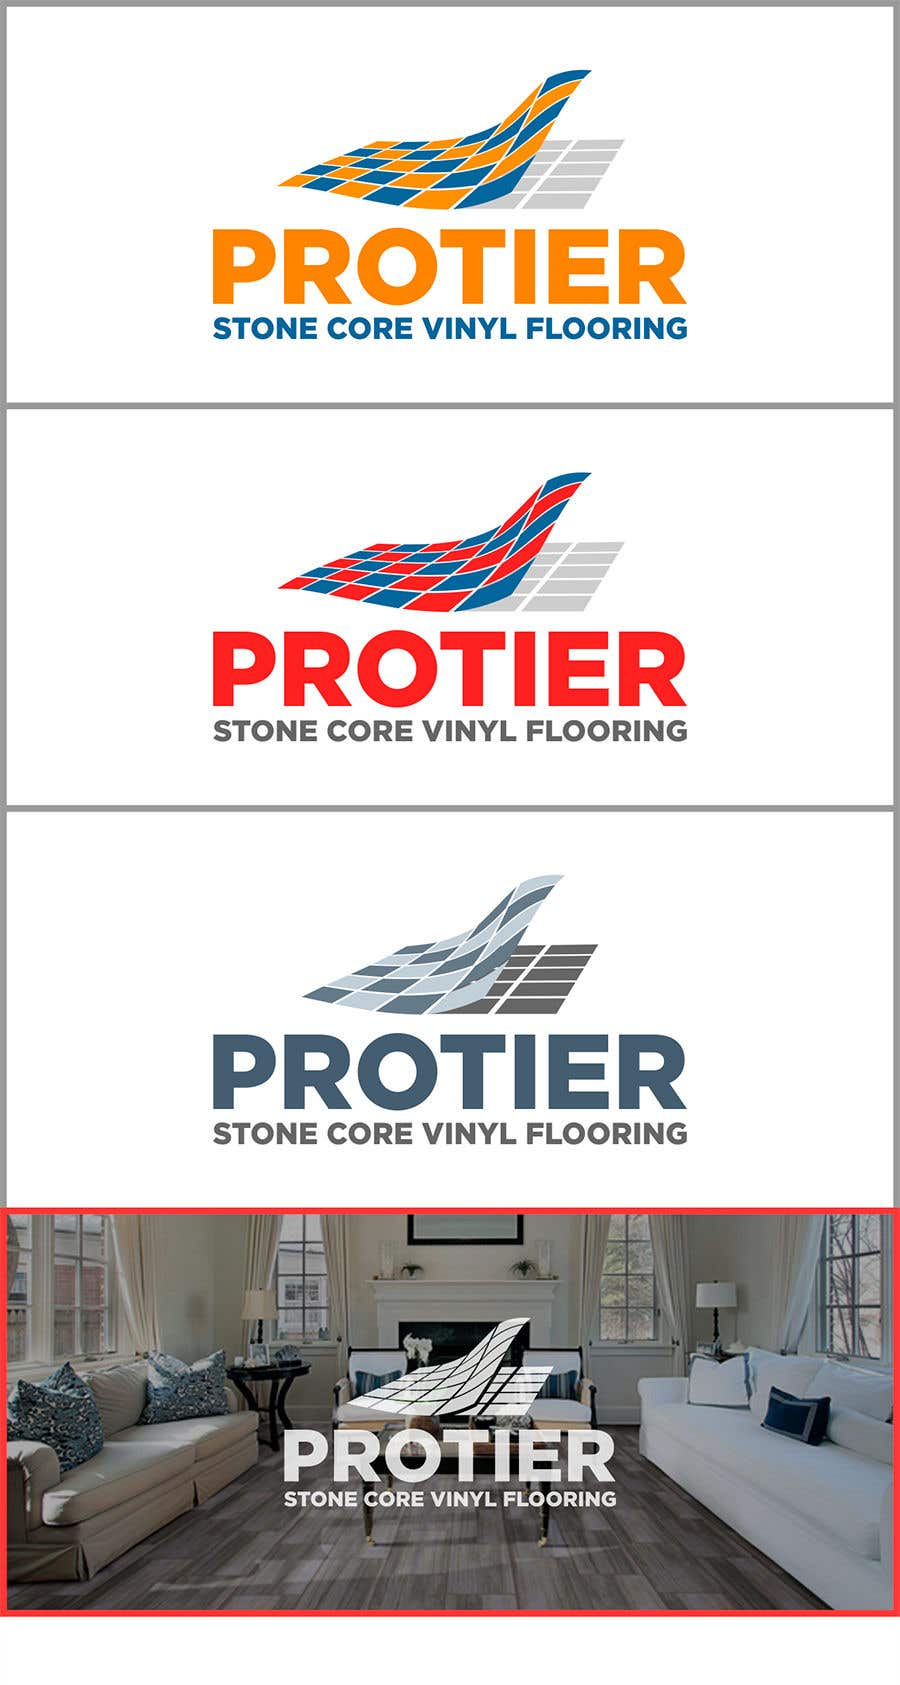 Bài tham dự cuộc thi #132 cho Need a logo for a new brand of flooring products